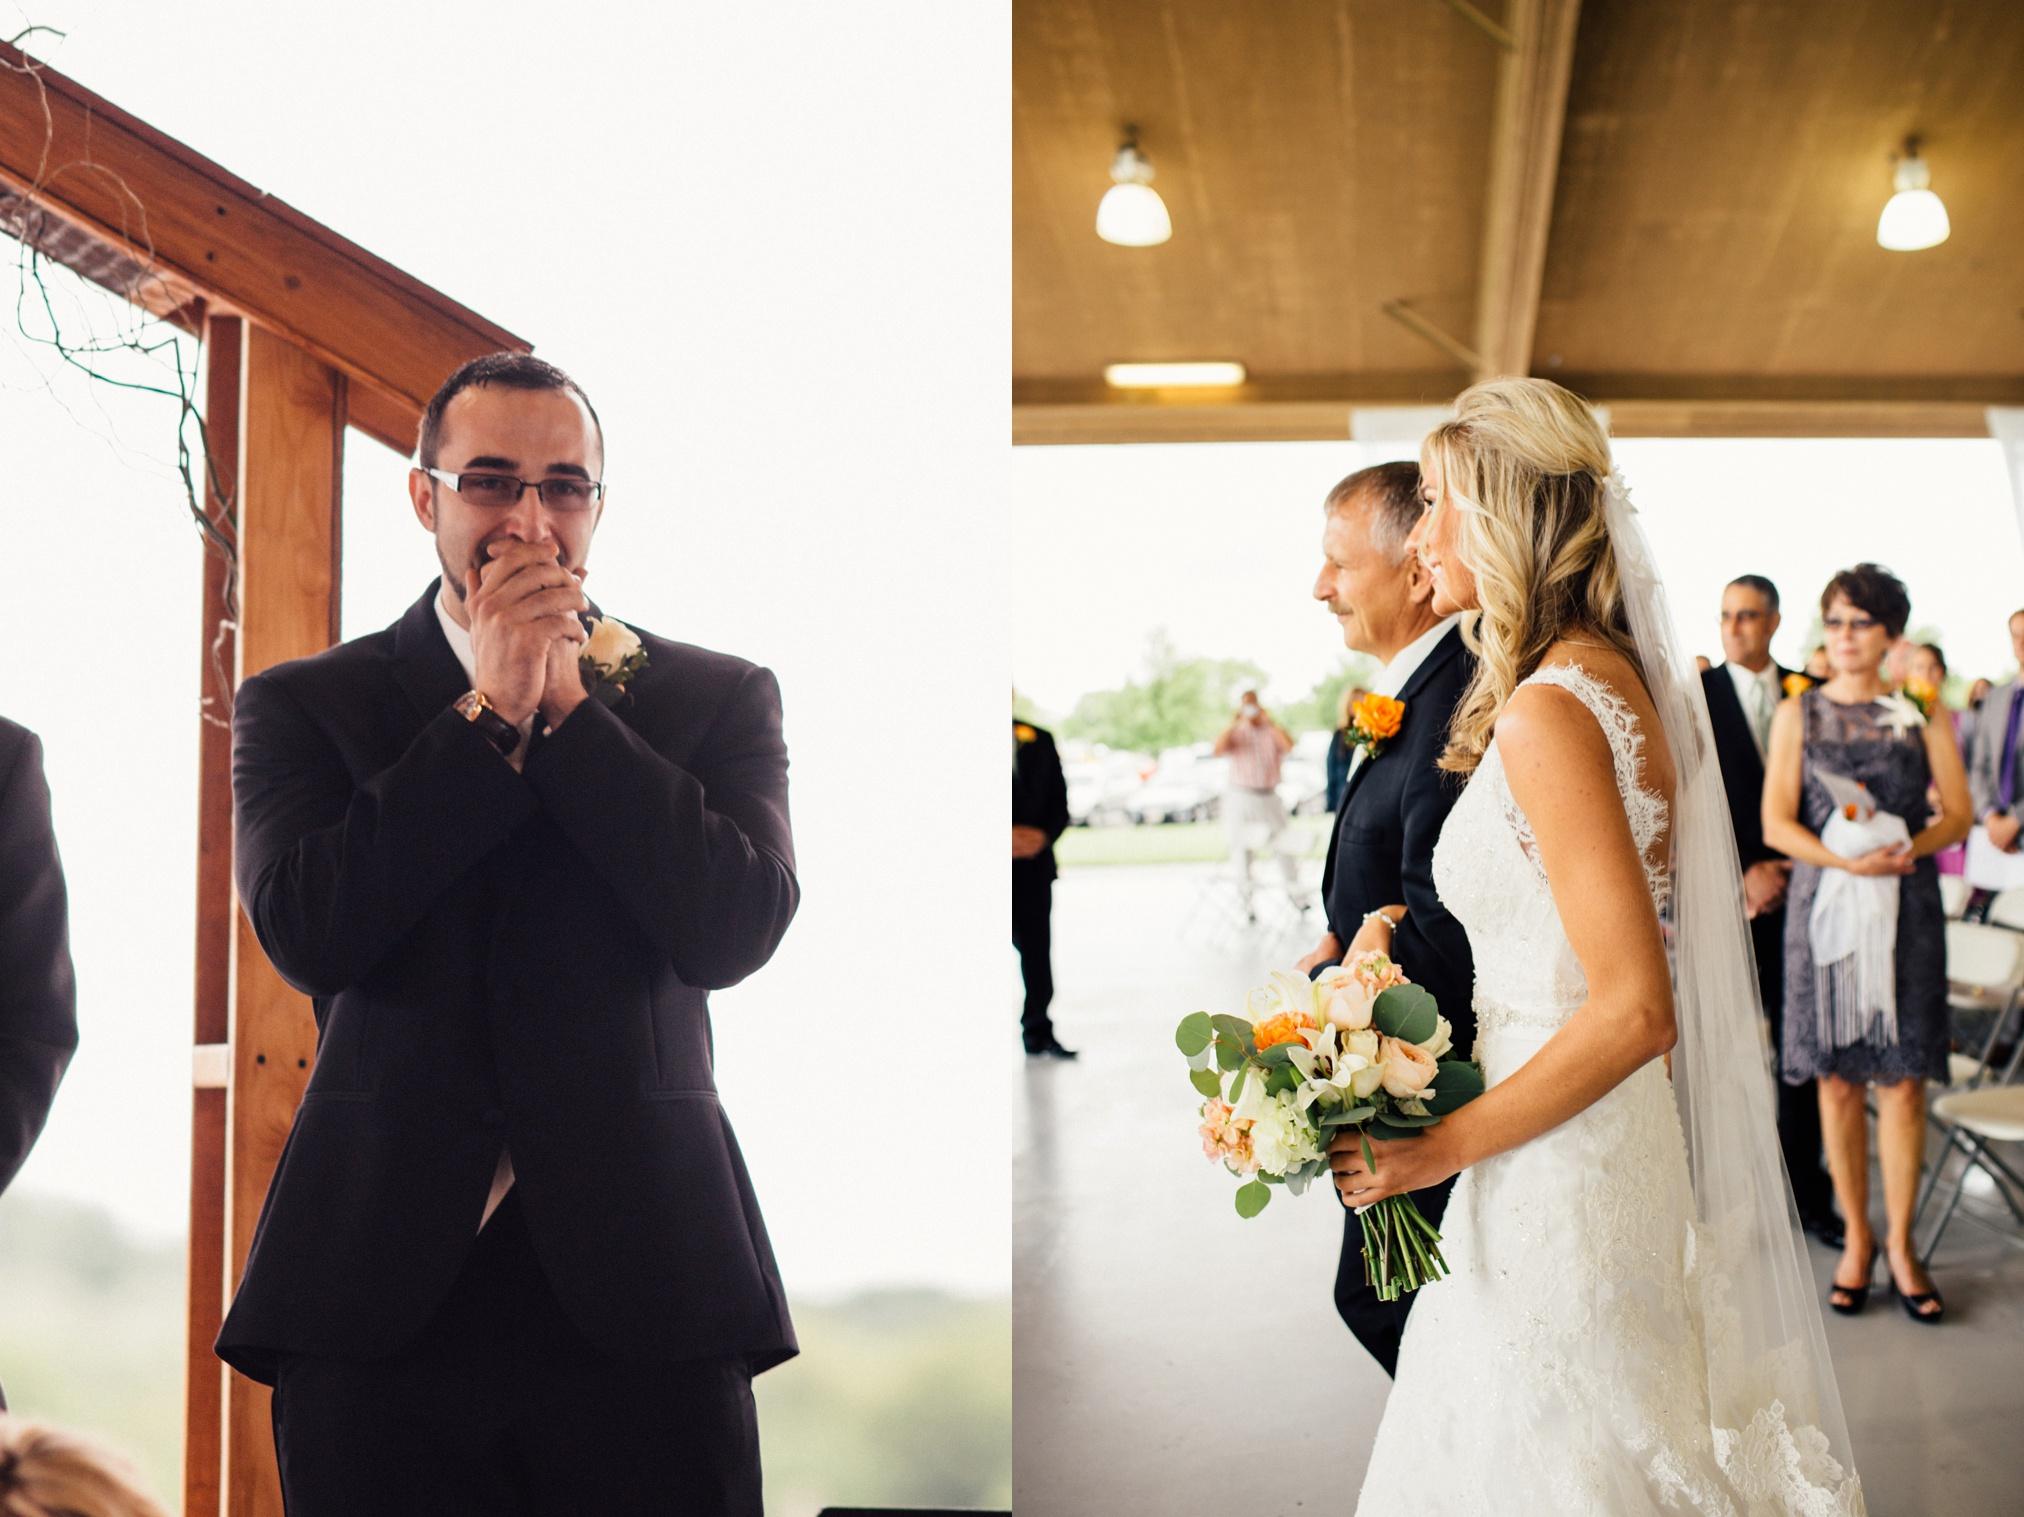 schmid_wedding-389.jpg